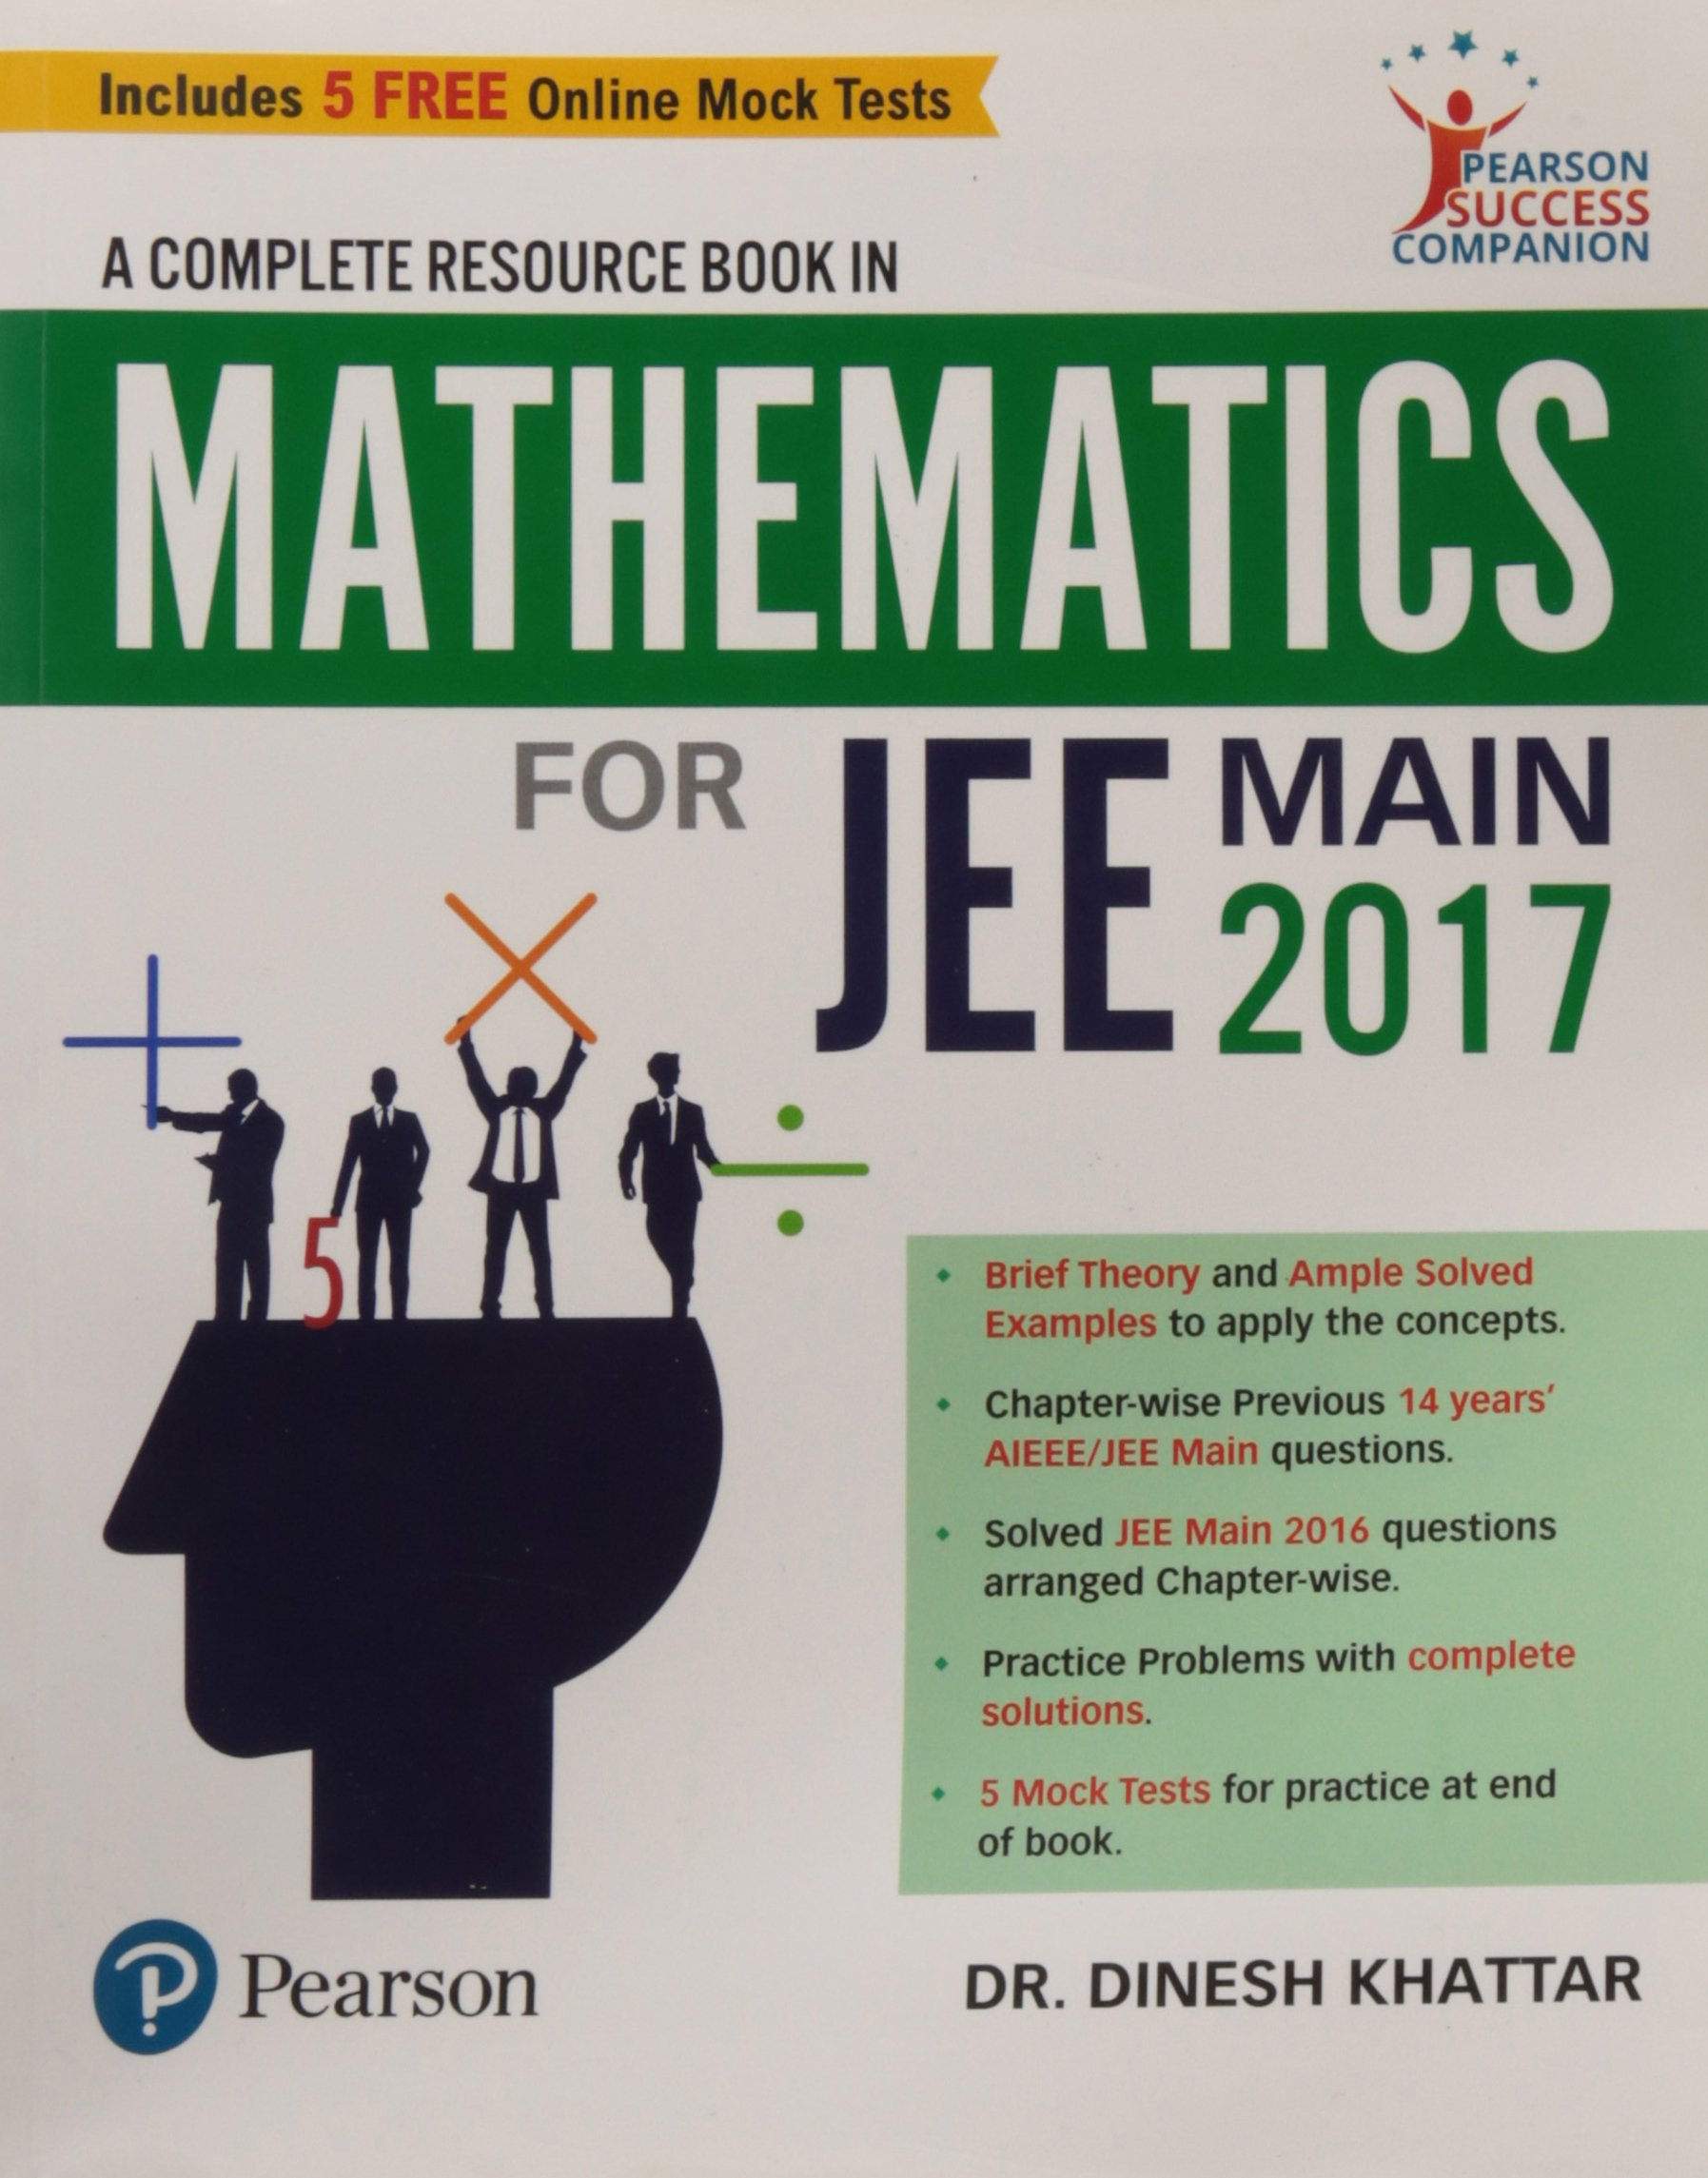 mathematics for jee mains 2017 amazon in khattar books